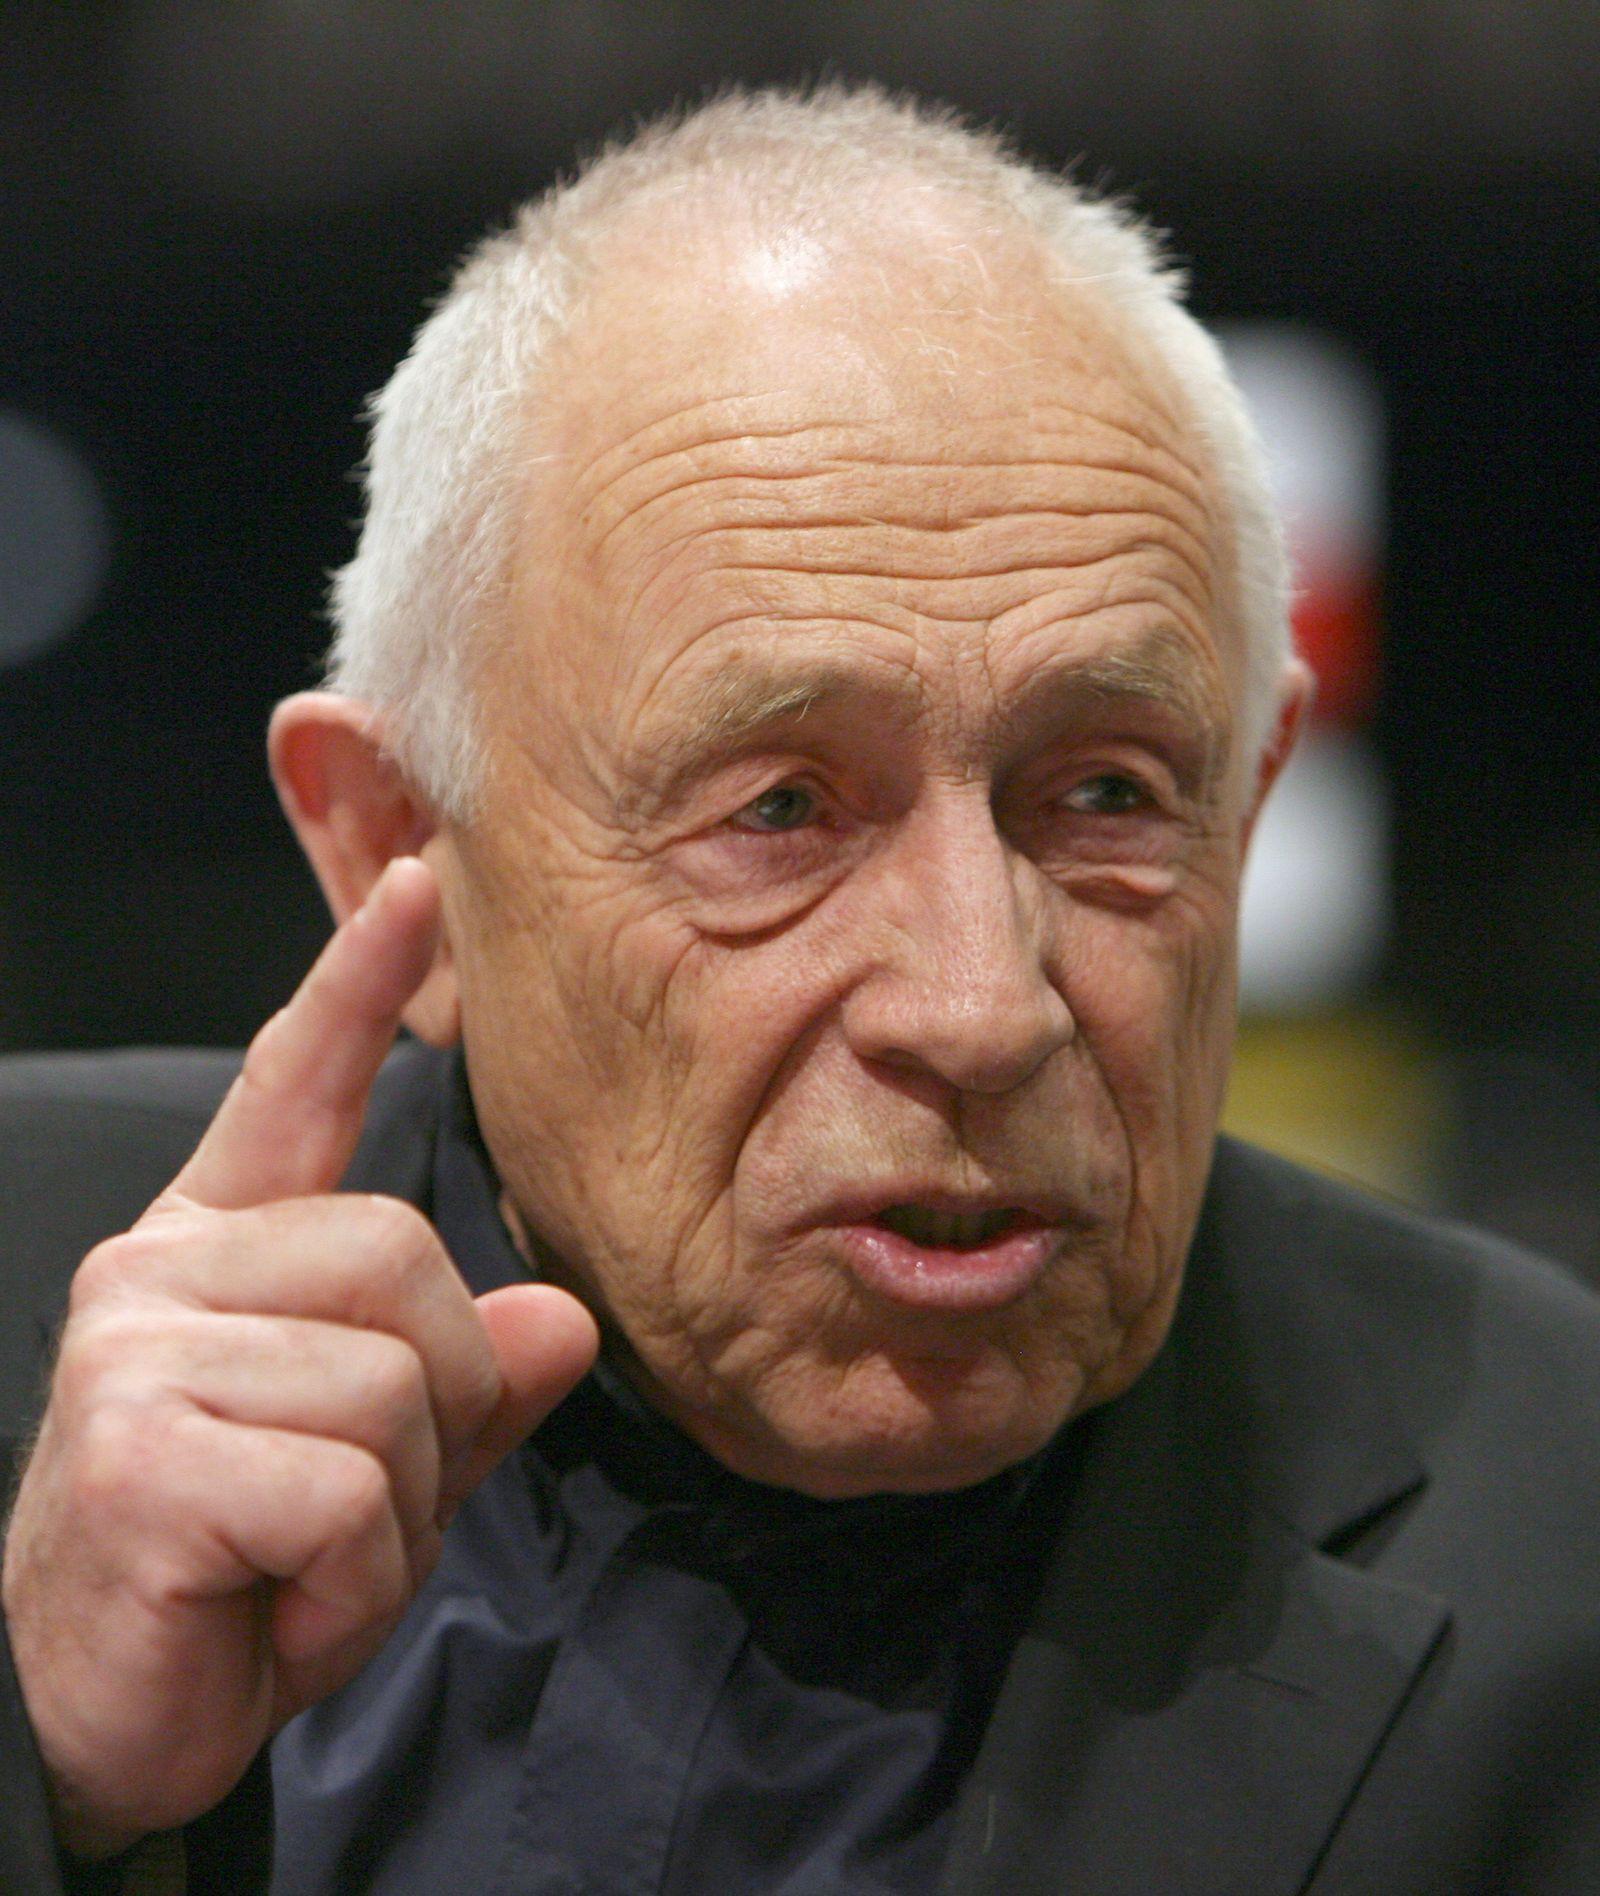 Heiner Geißler hebt den finger